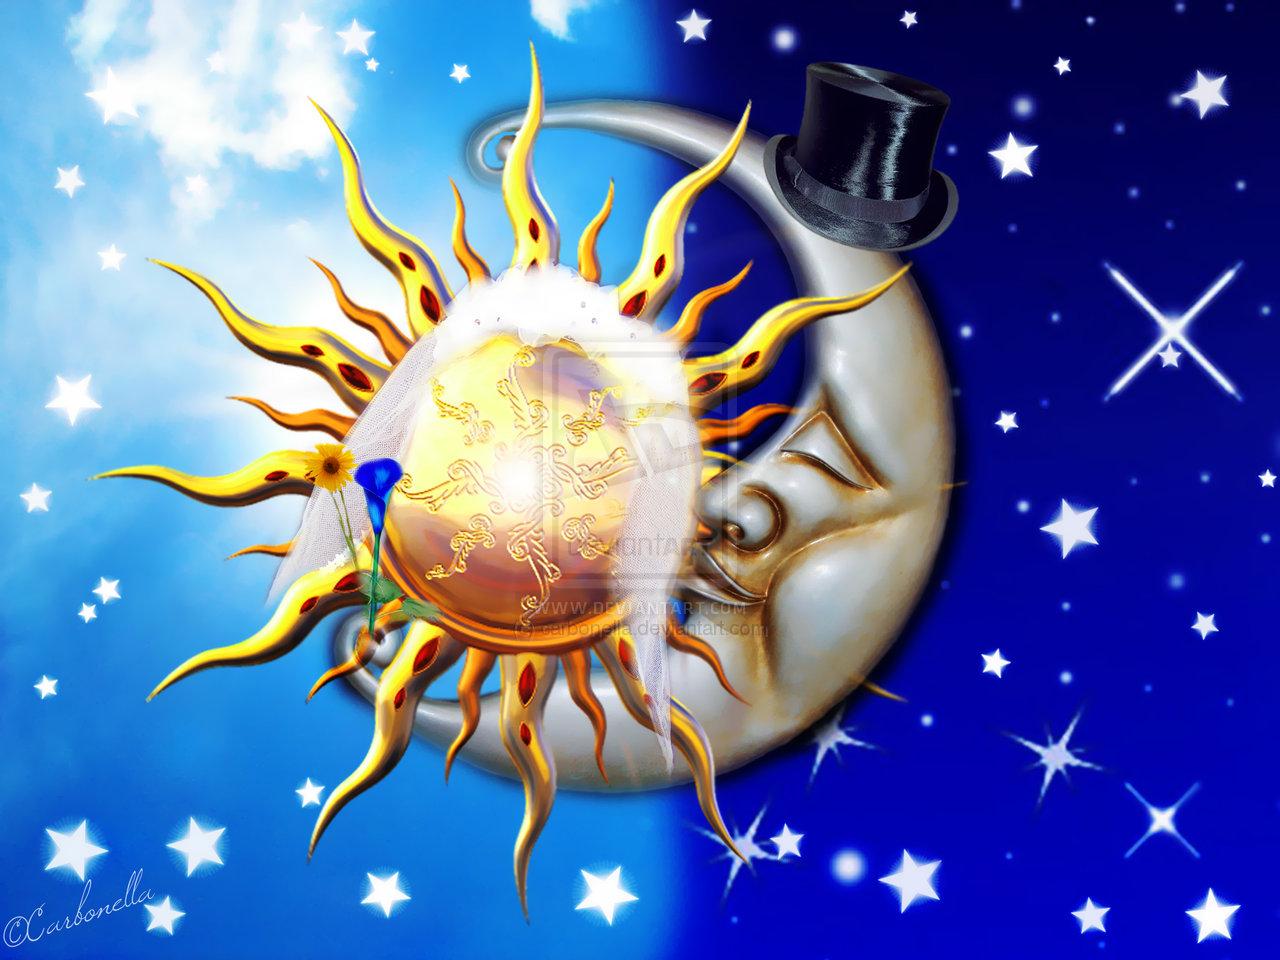 celestial sun and moon wallpaper wallpapersafari